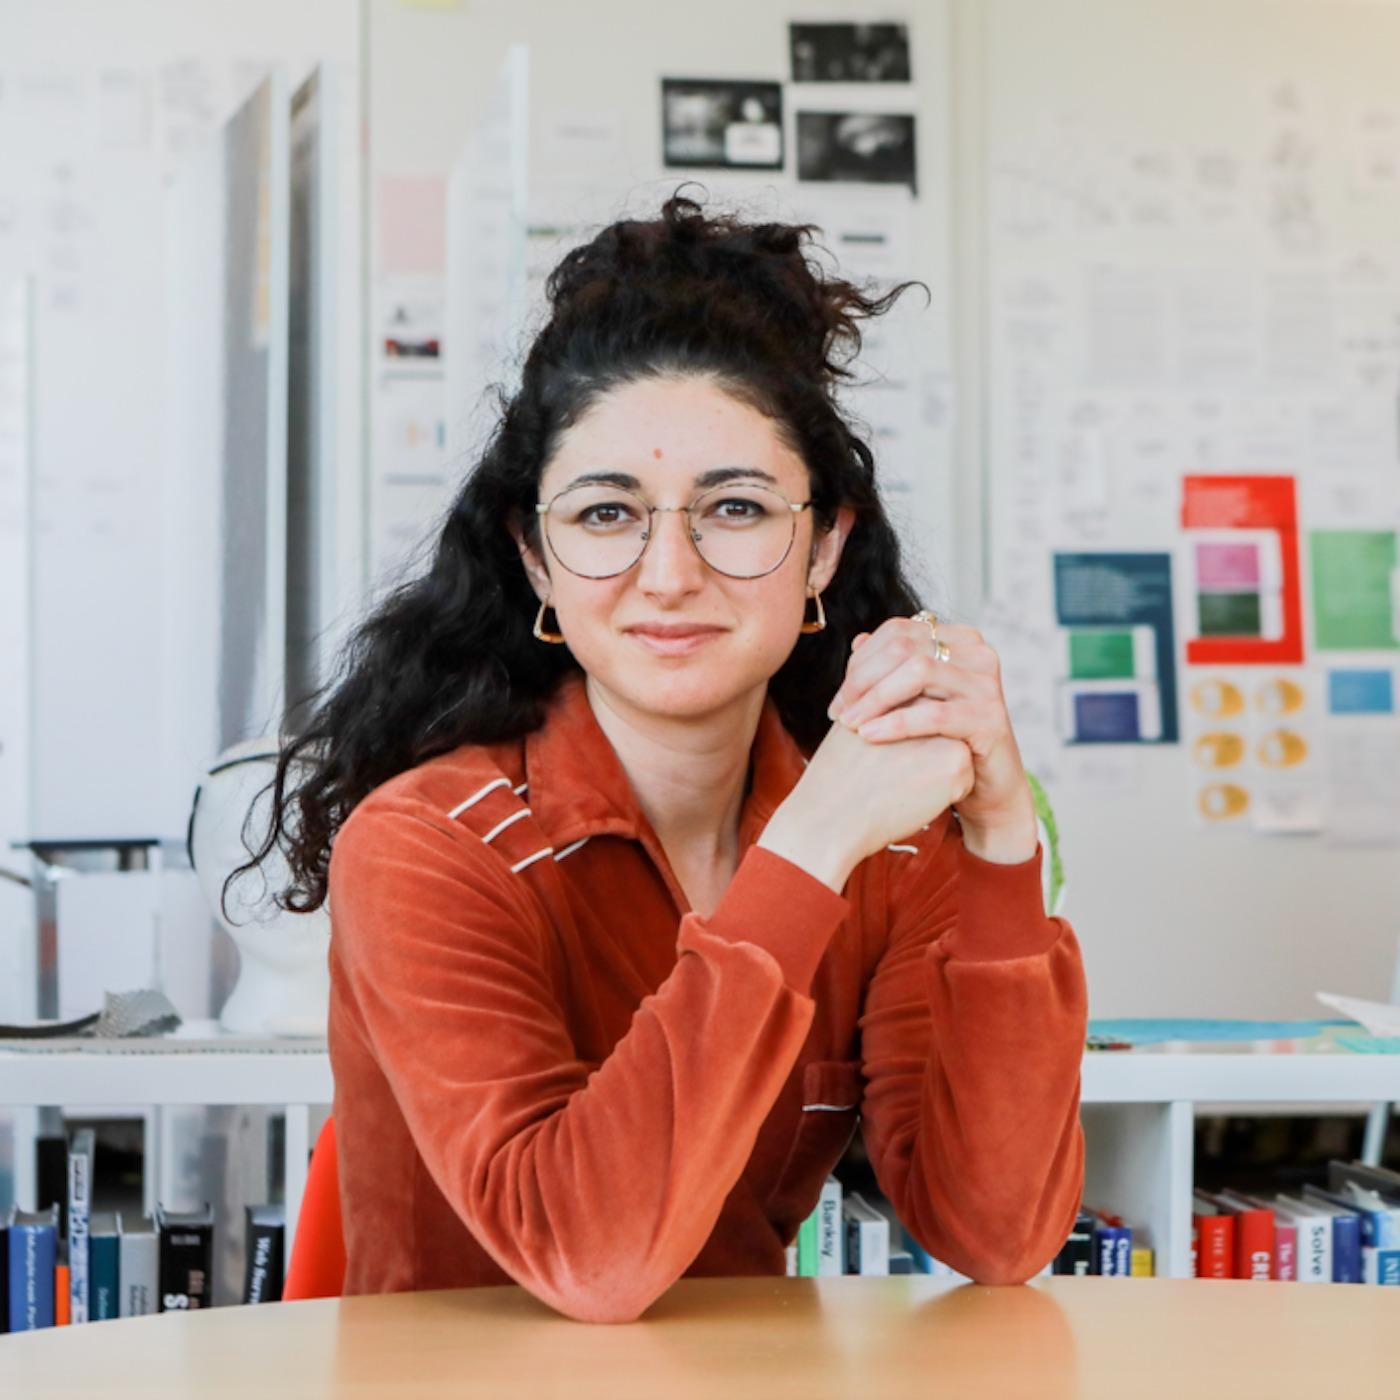 Anna Roumiantseva